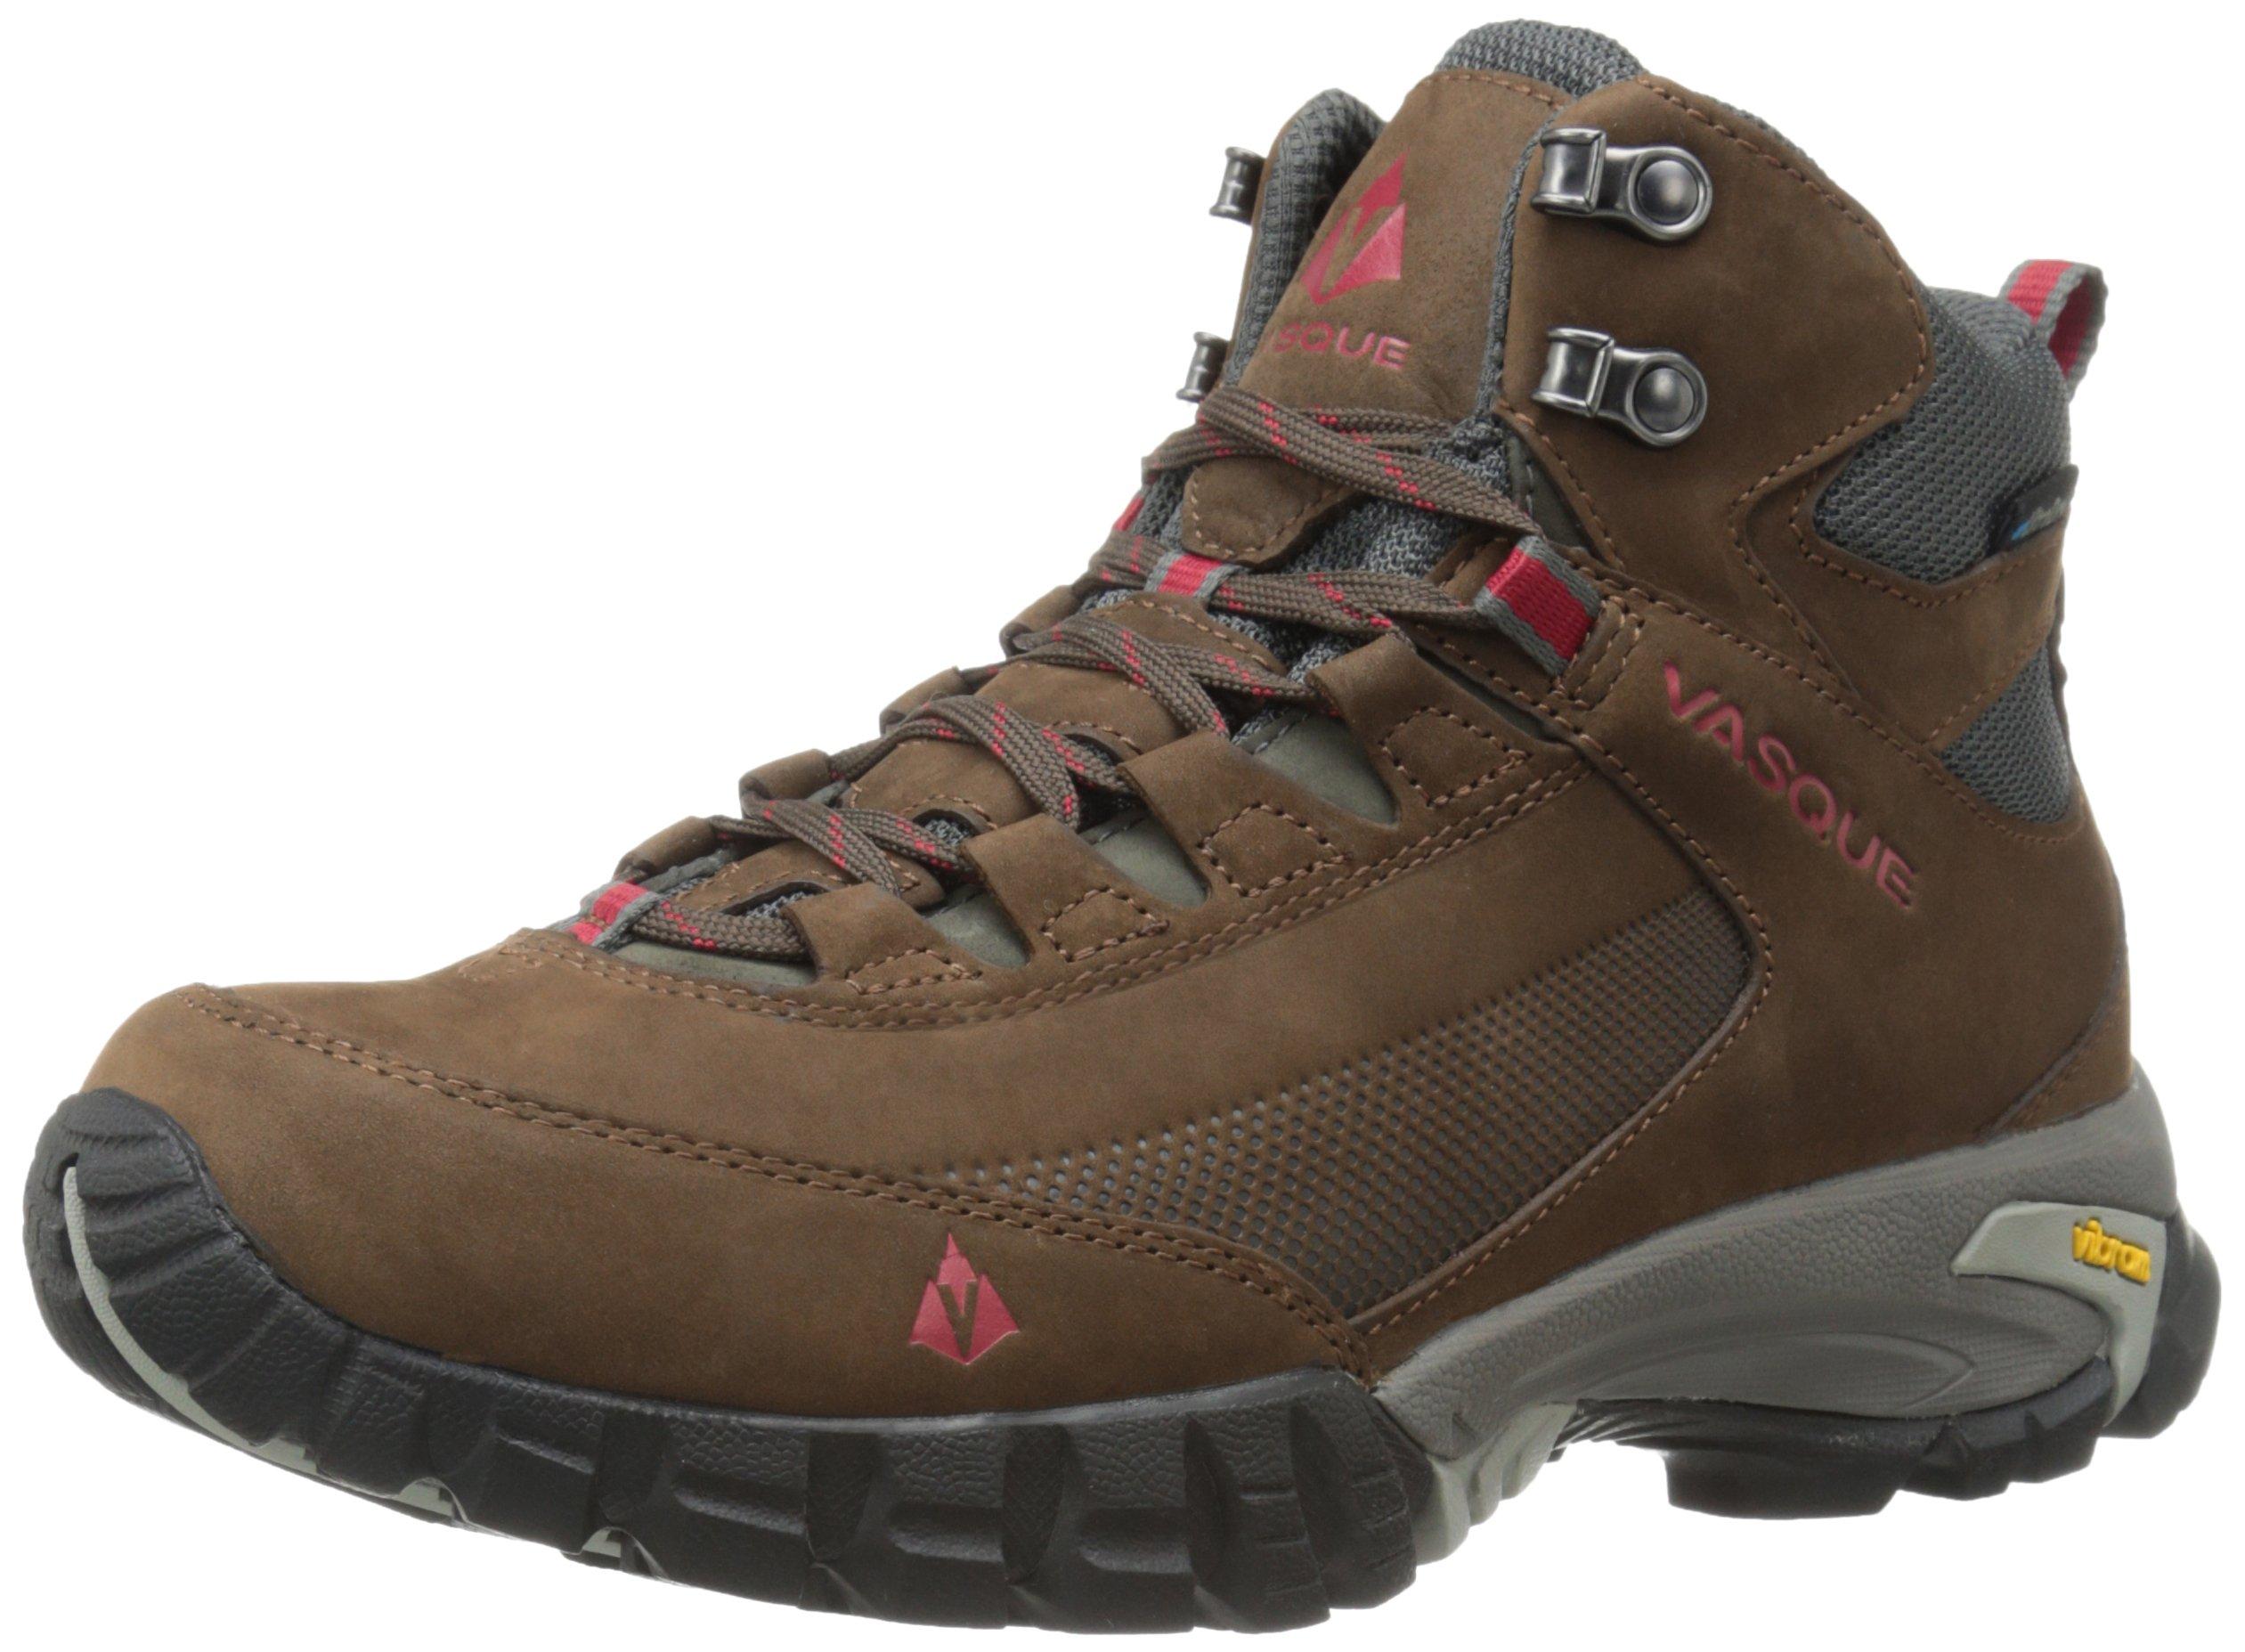 Vasque Men's Talus Trek Ultradry Hiking Boot, Slate Brown/Chili Pepper, 12 M US